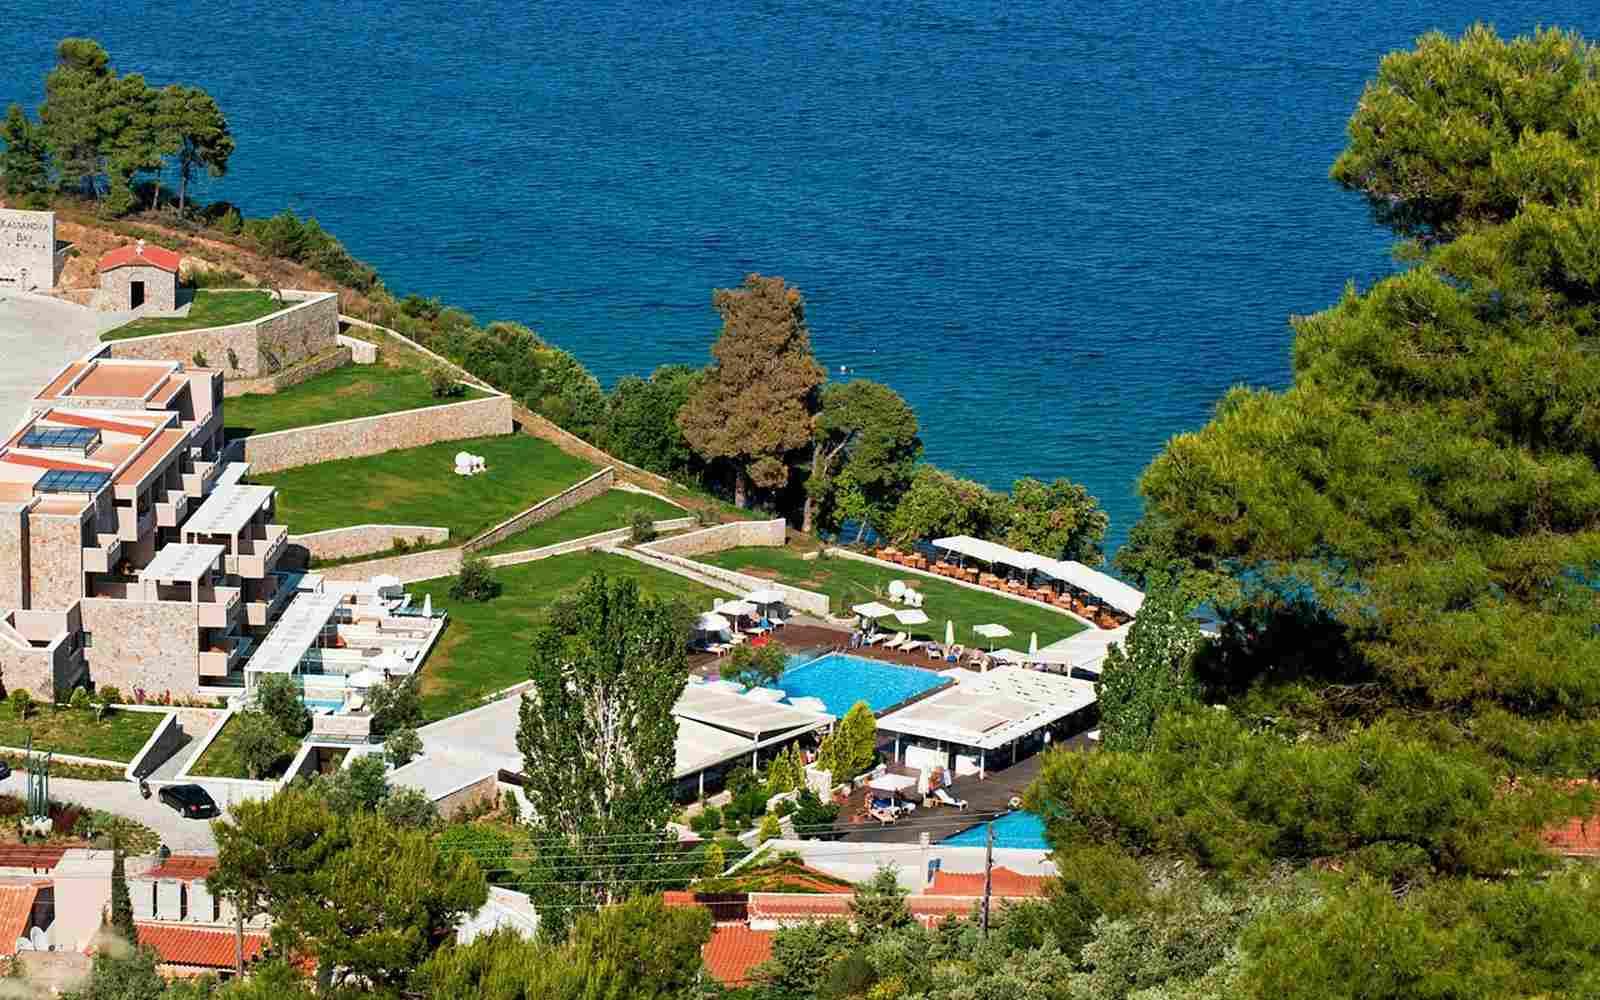 https://www.bellacosta.org/wp-content/uploads/2016/03/summer-hotel-03.jpg